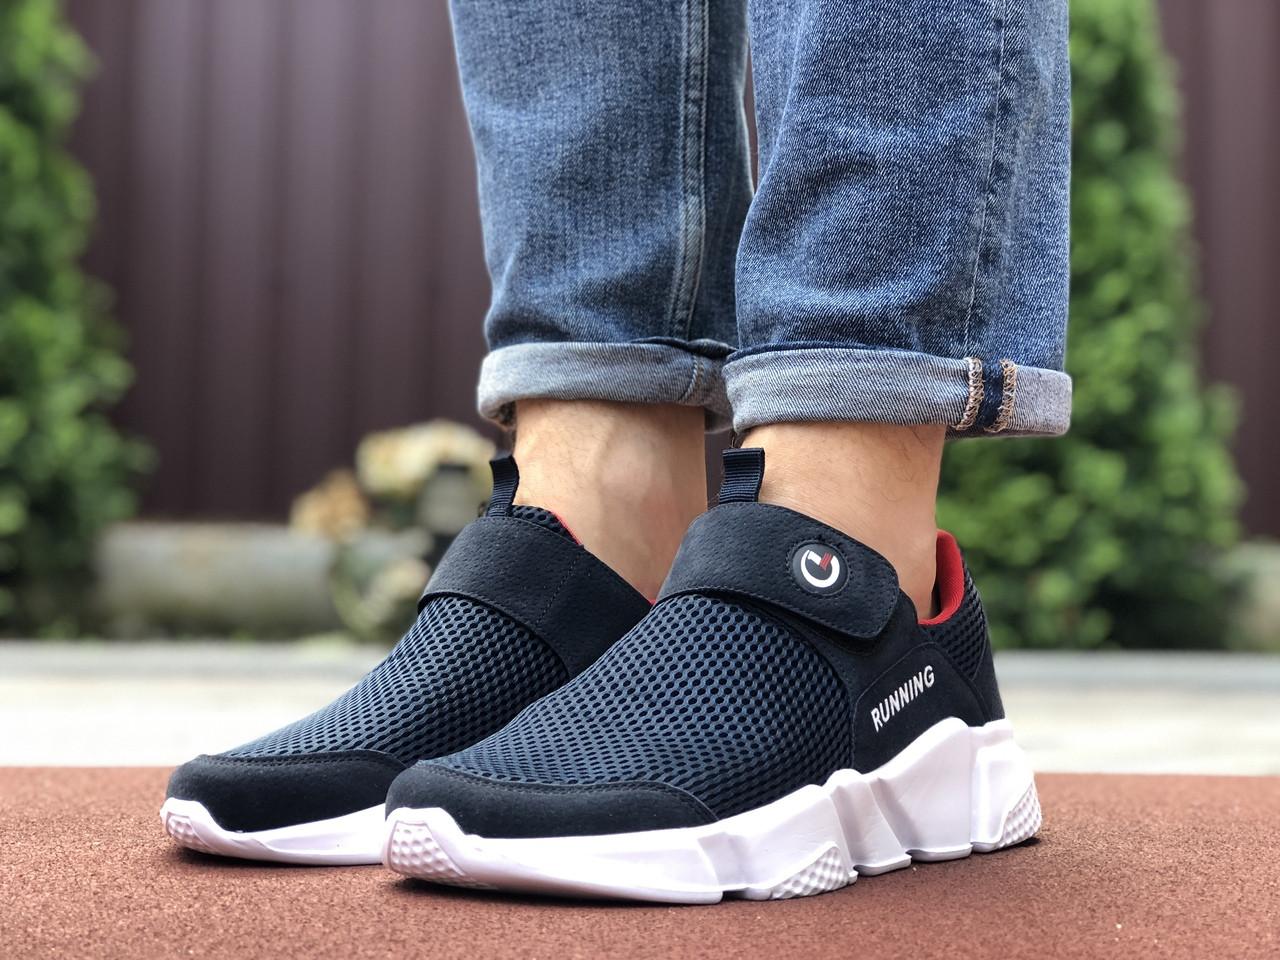 Мужские кроссовки Running (темно-синие с белым) 9575